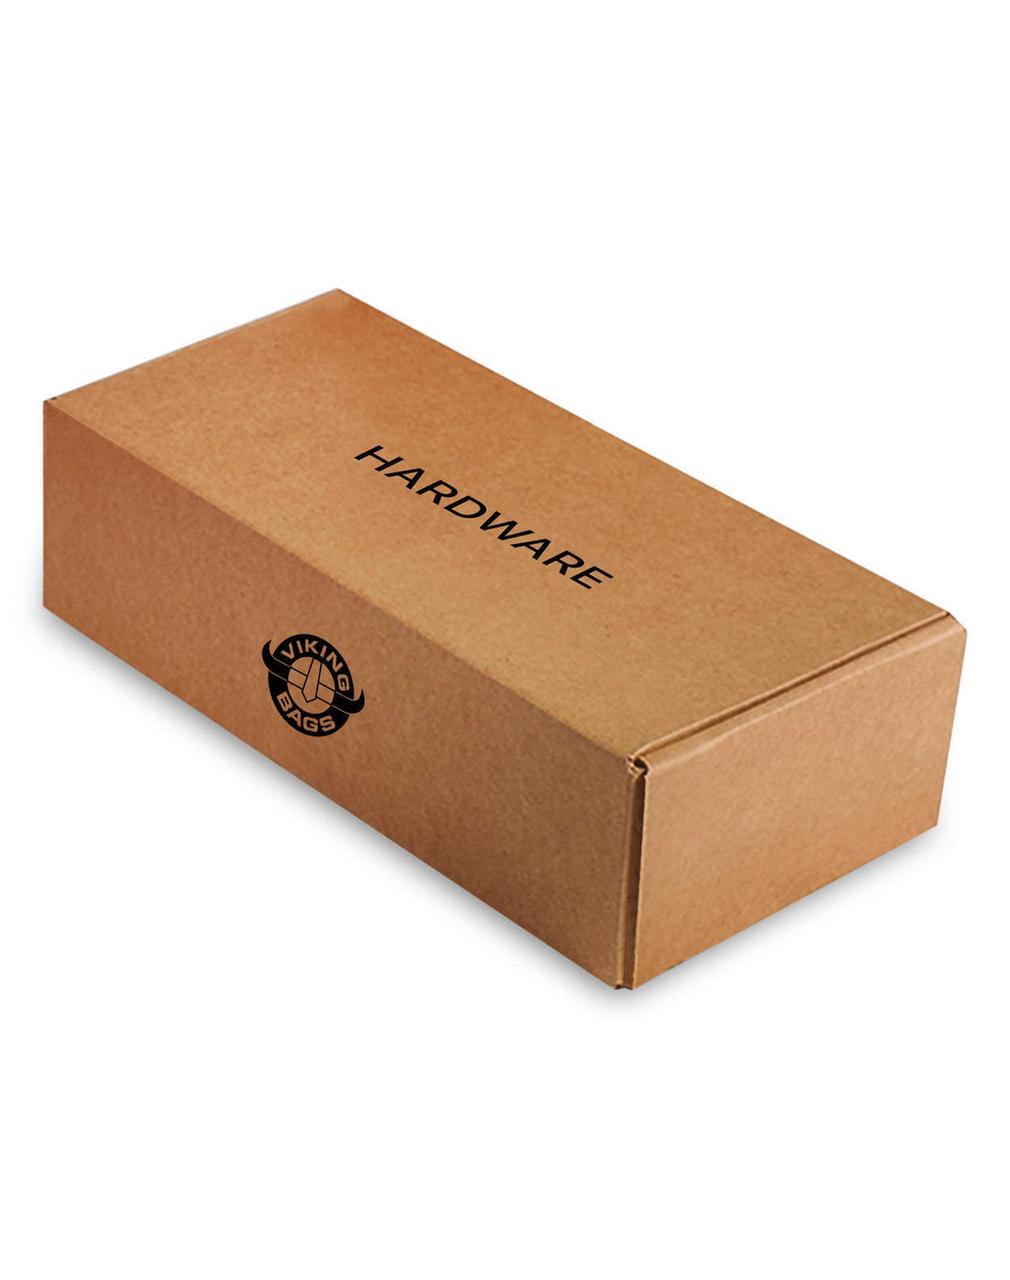 Honda VTX 1800 F Spear Shock Cutout Motorcycle Saddlebags Hardware Box